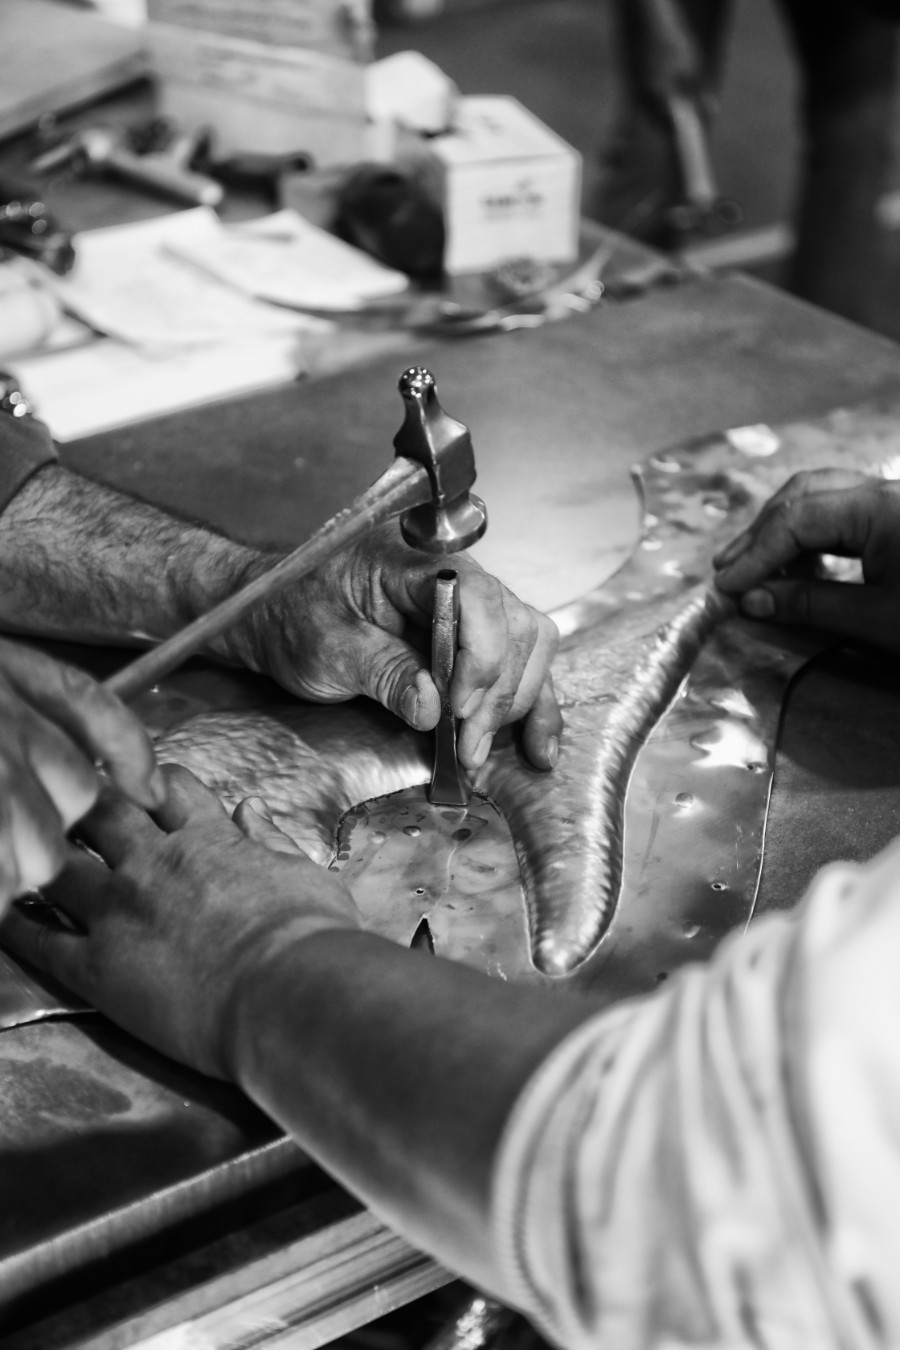 metalworking, metal work, delicatejewelry, design, casting metal, casting, metal, sand casting, welding, luxury furniture, piece of art, craftsmanship metal work The Art of Metalworking Behind Boca do Lobo's Luxury Furniture behind the scenes boca do lobo 05